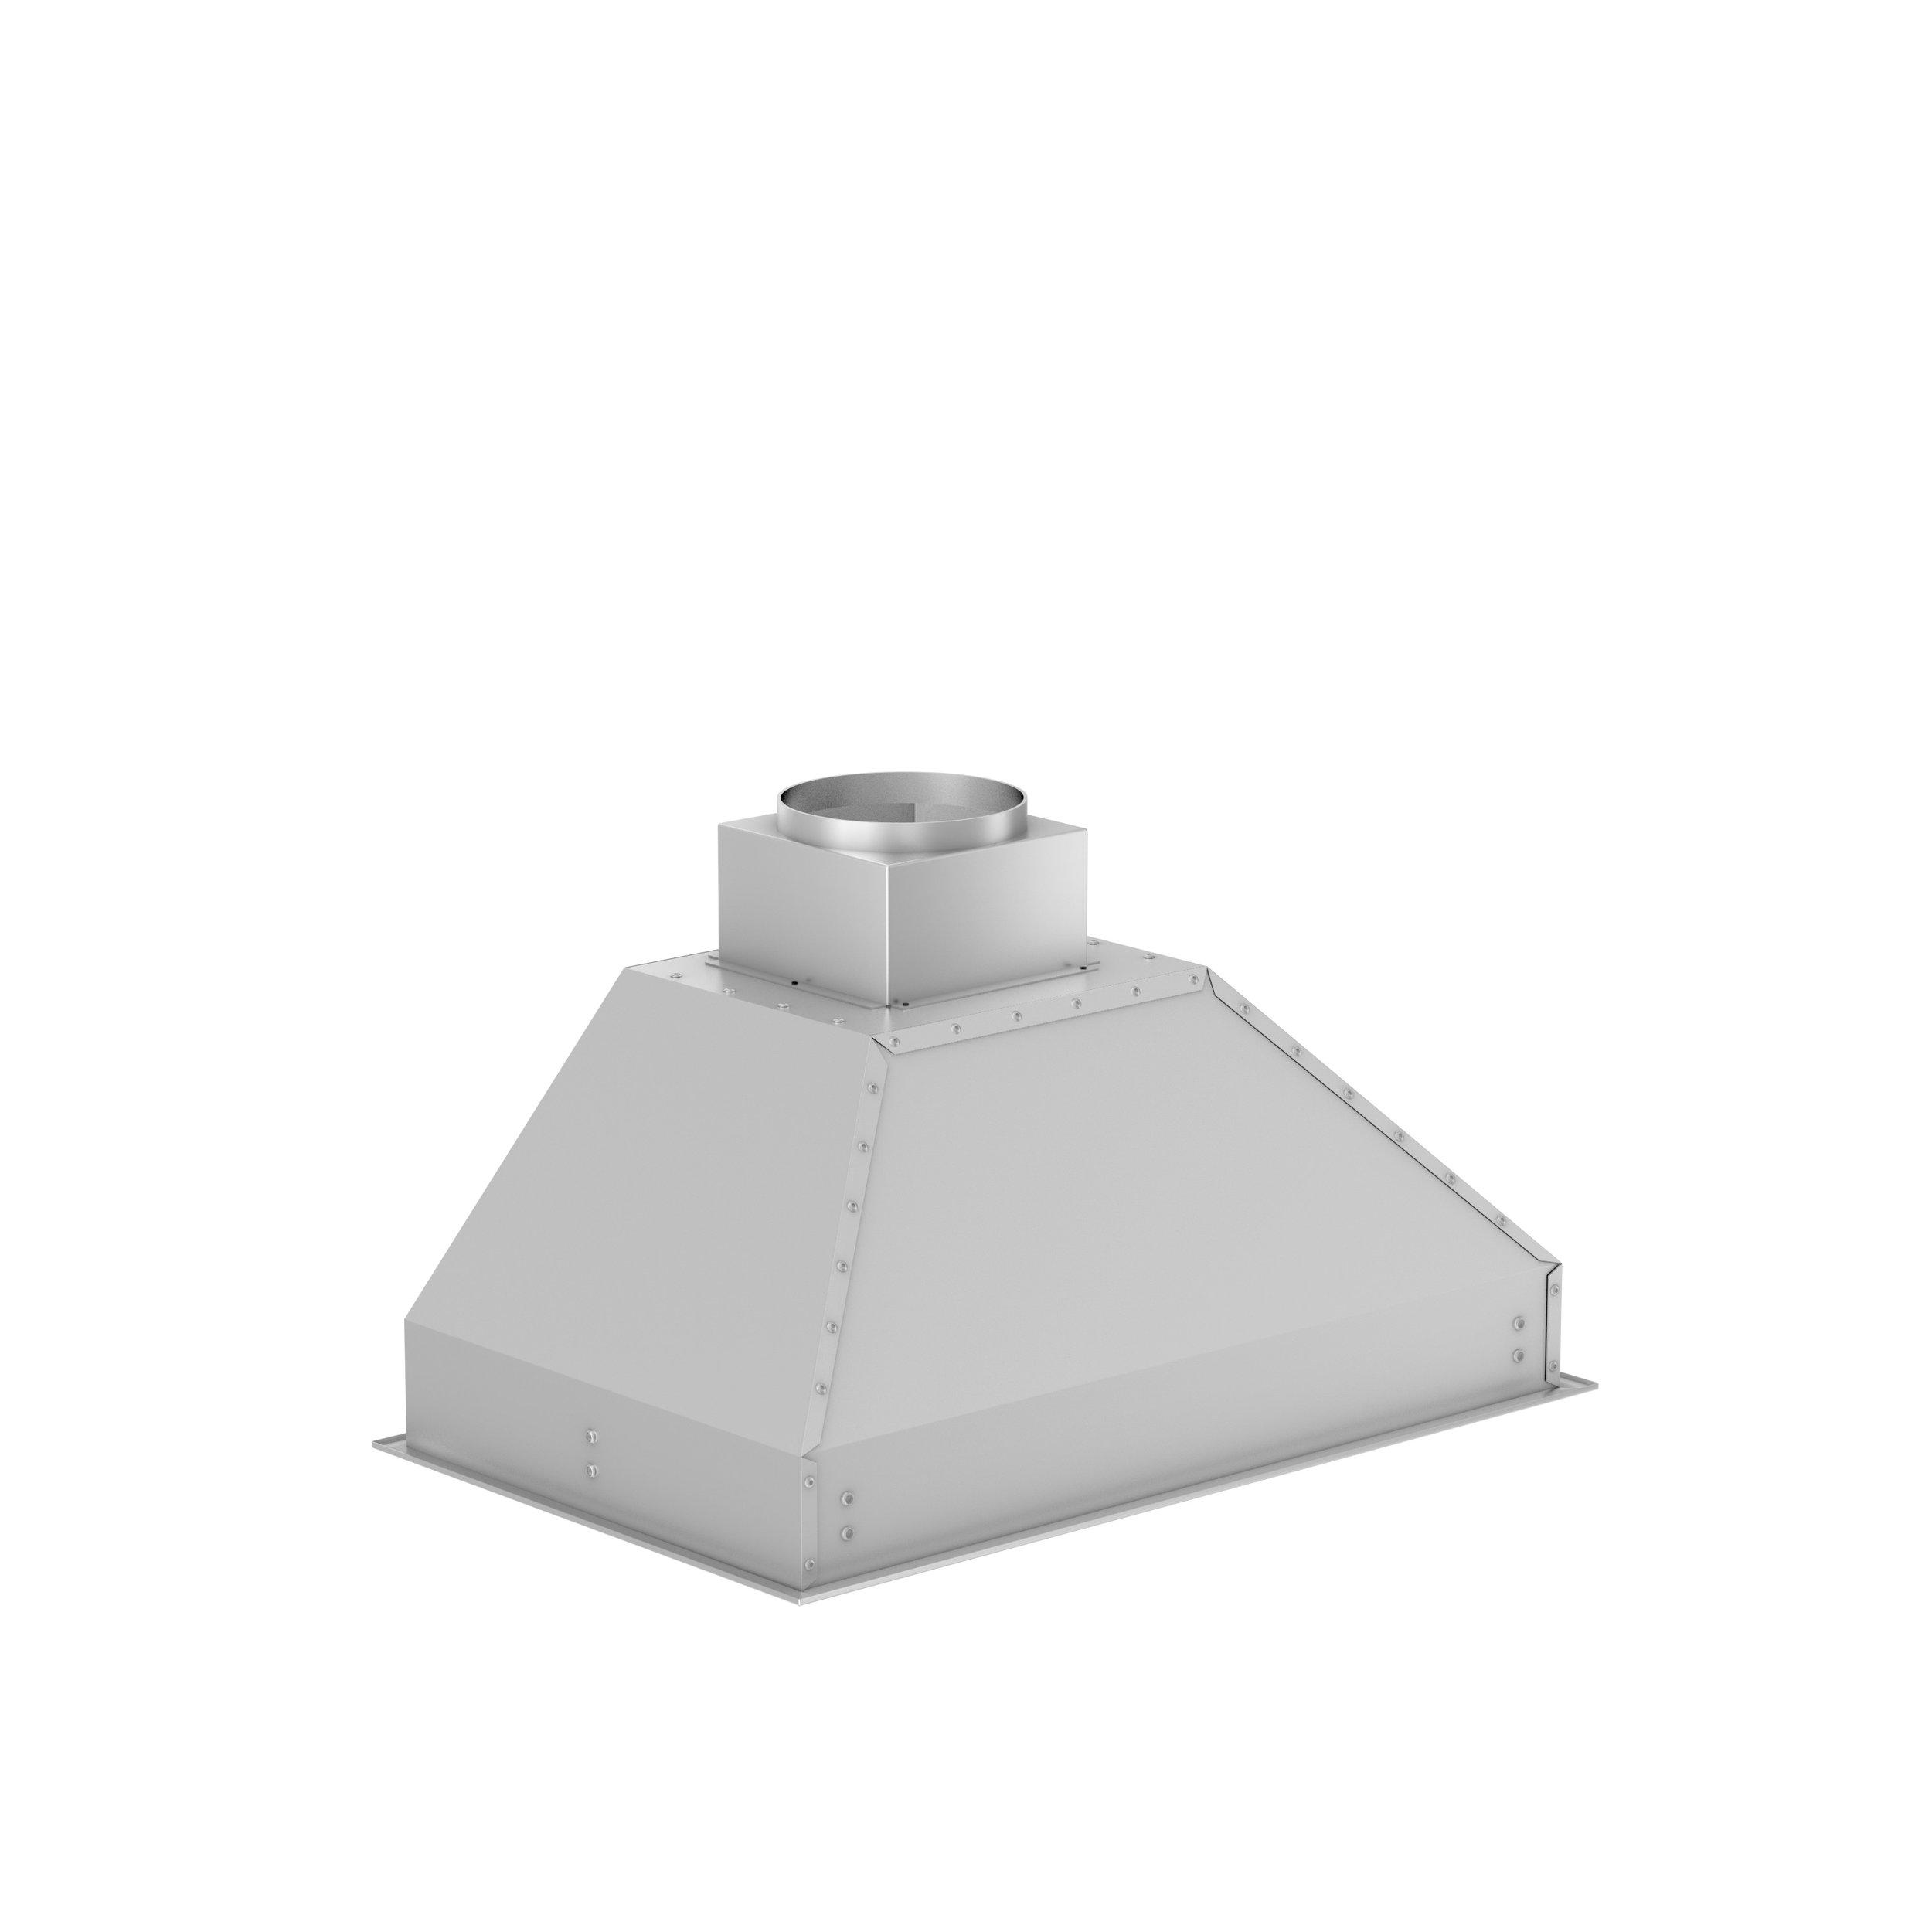 zline-stainless-steel-range-insert-721_34-top.jpeg